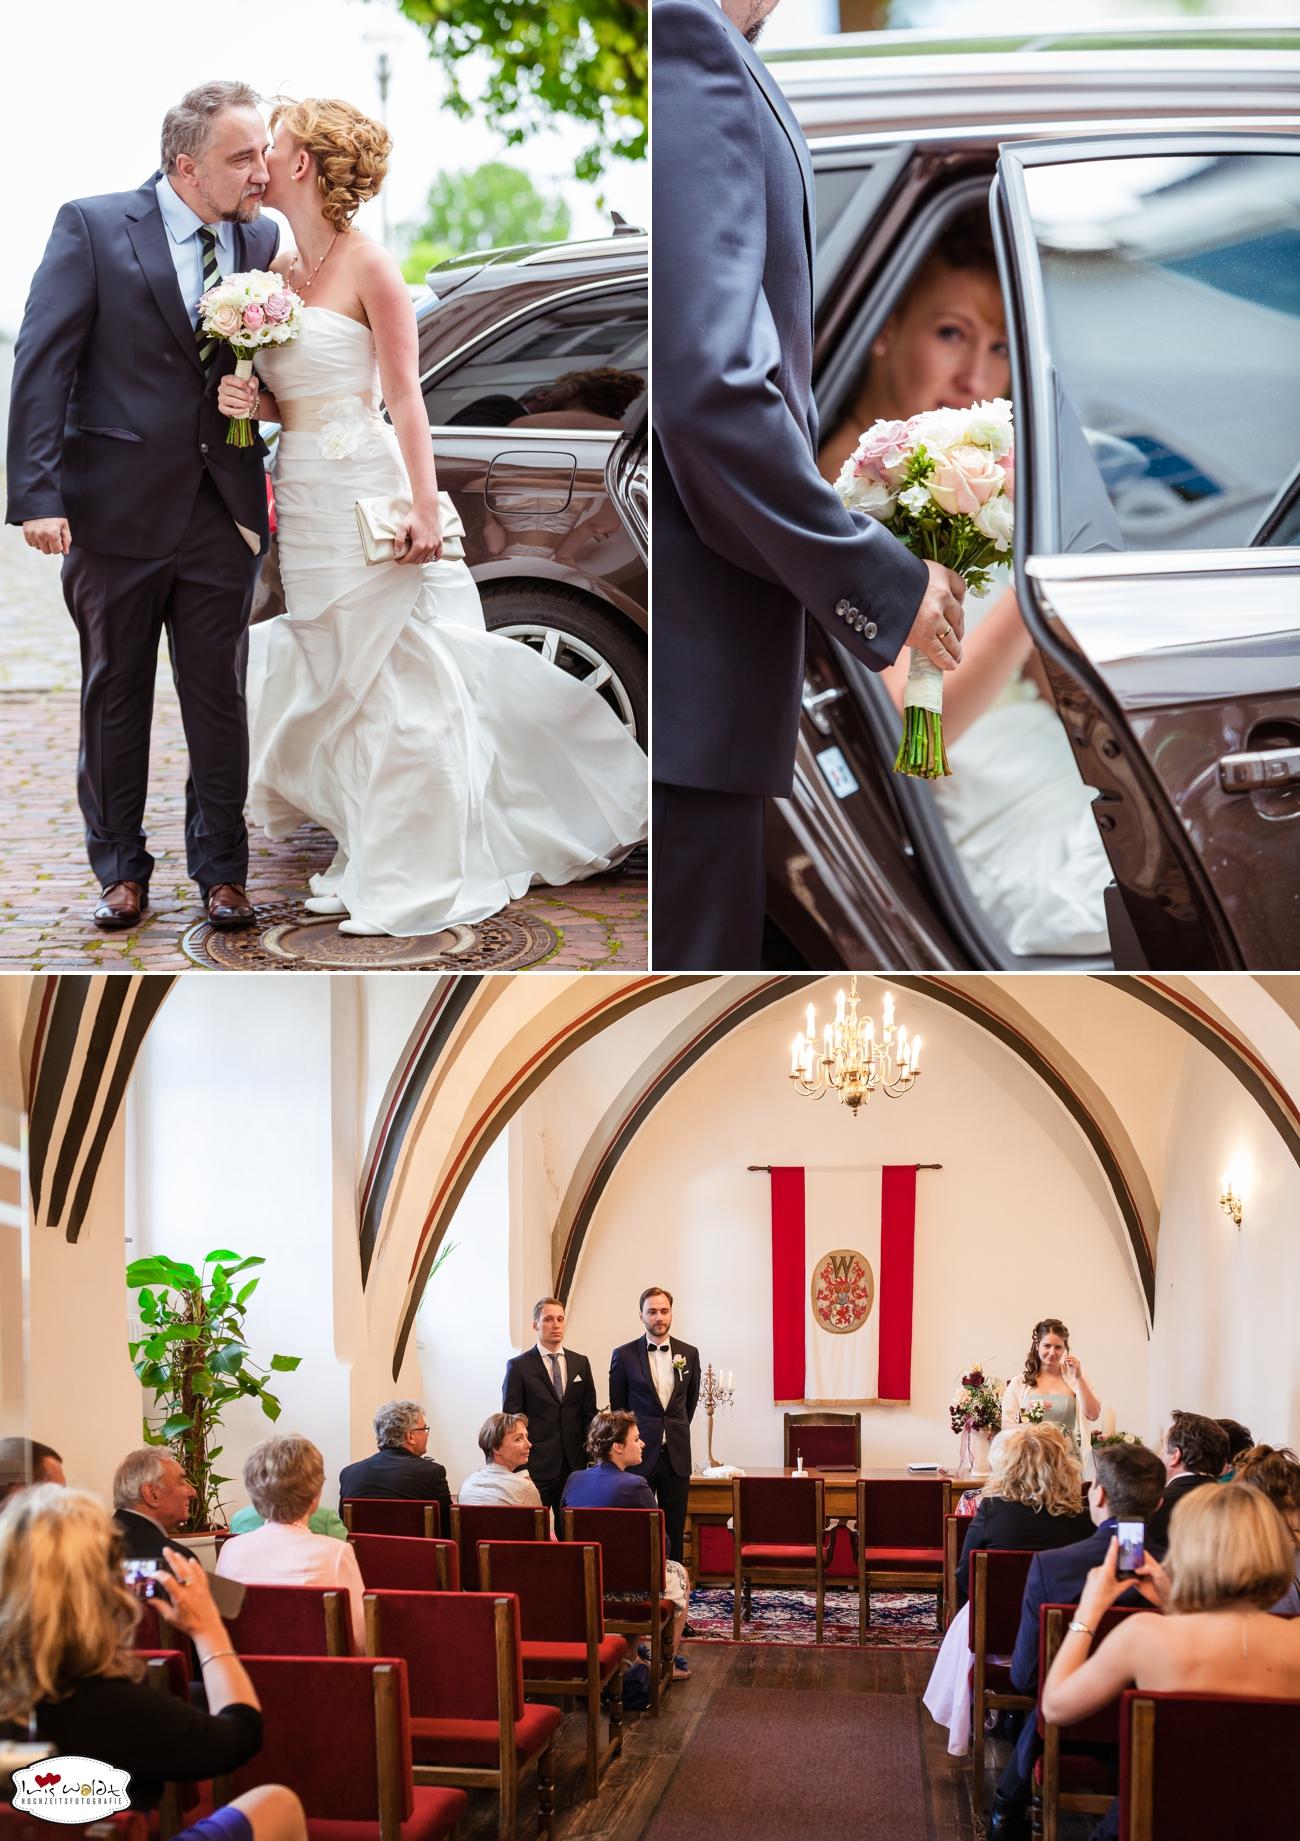 Heiraten in Uekermuende 2